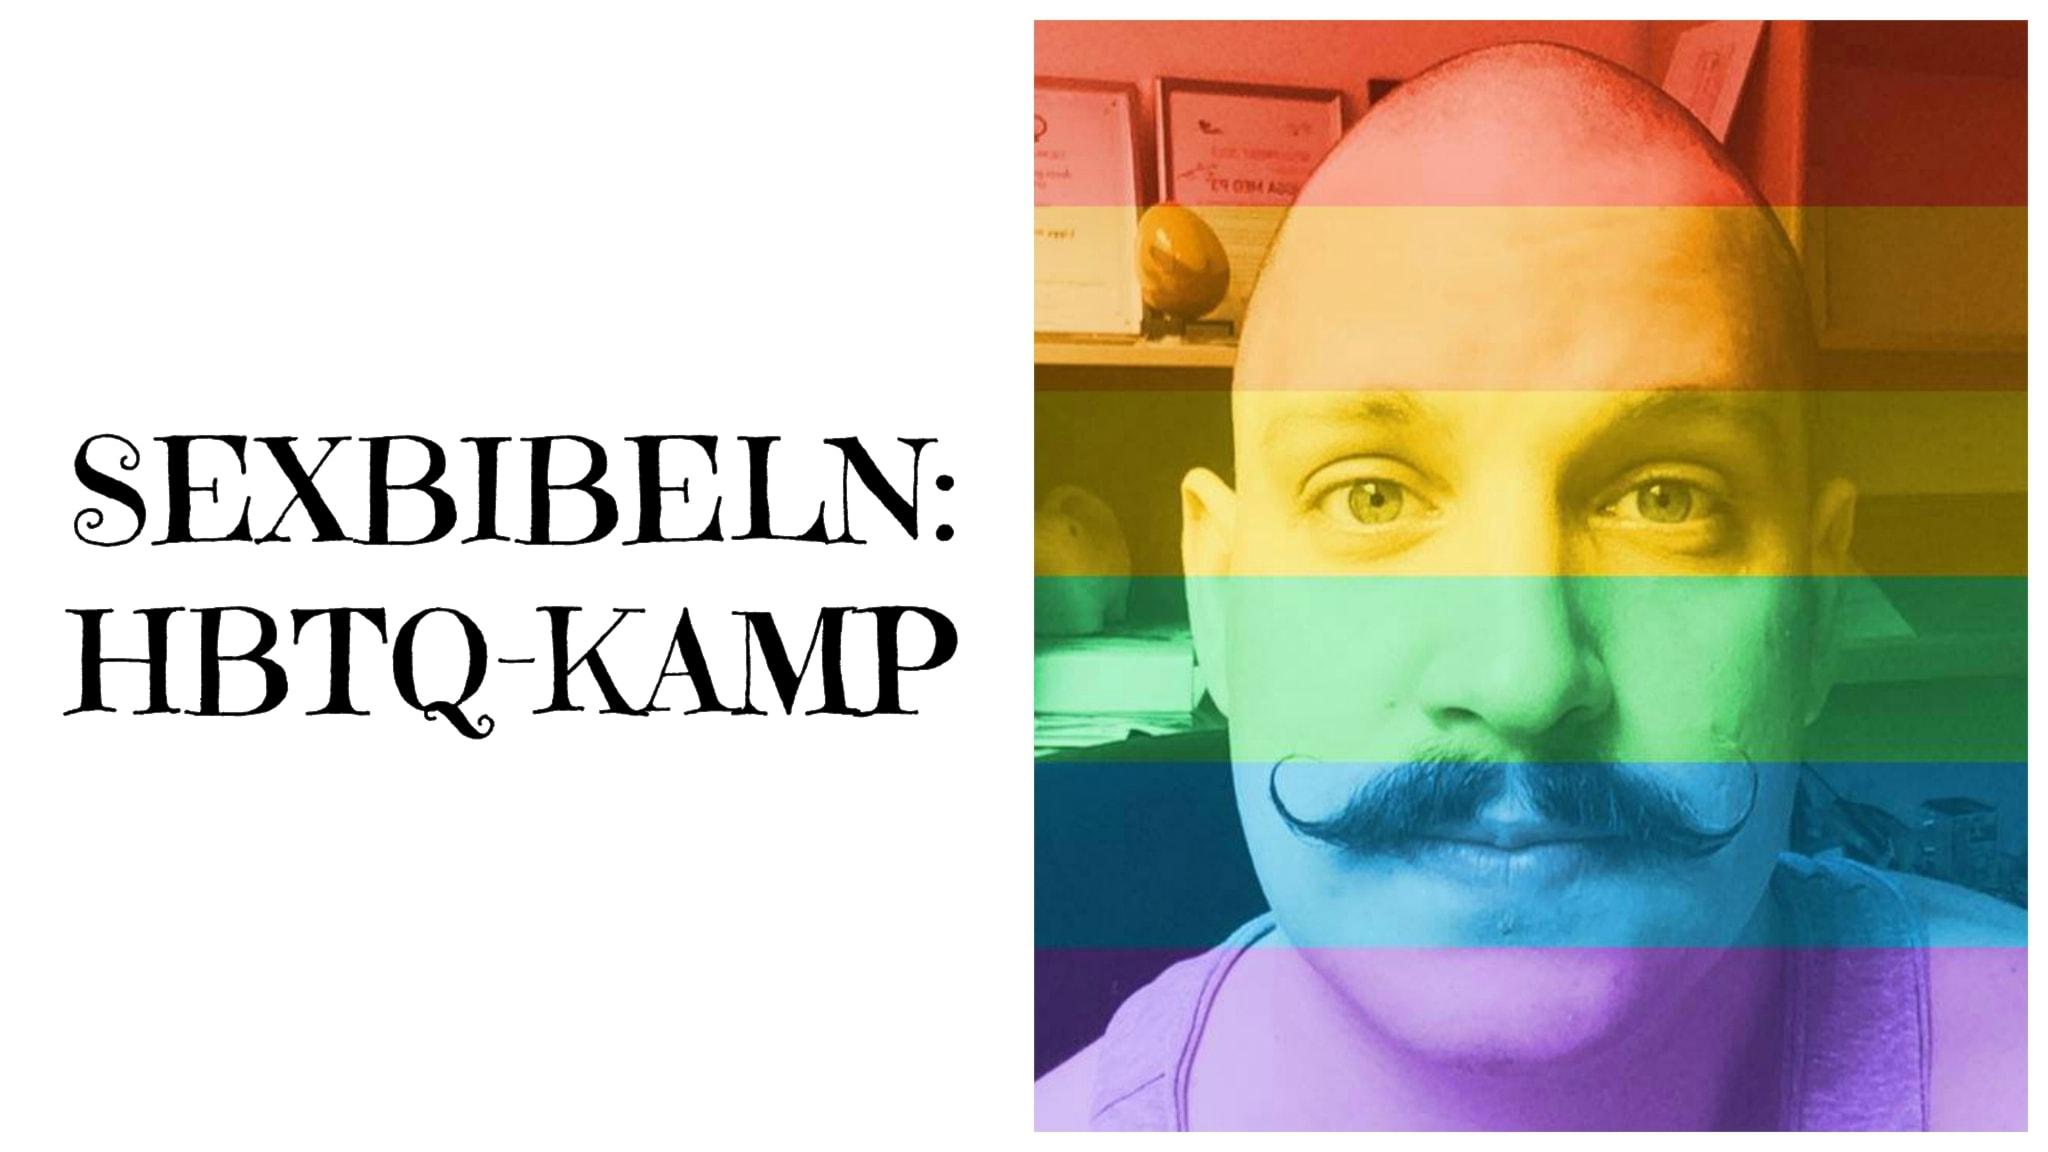 SEXBIBELN: HBTQ-KAMP